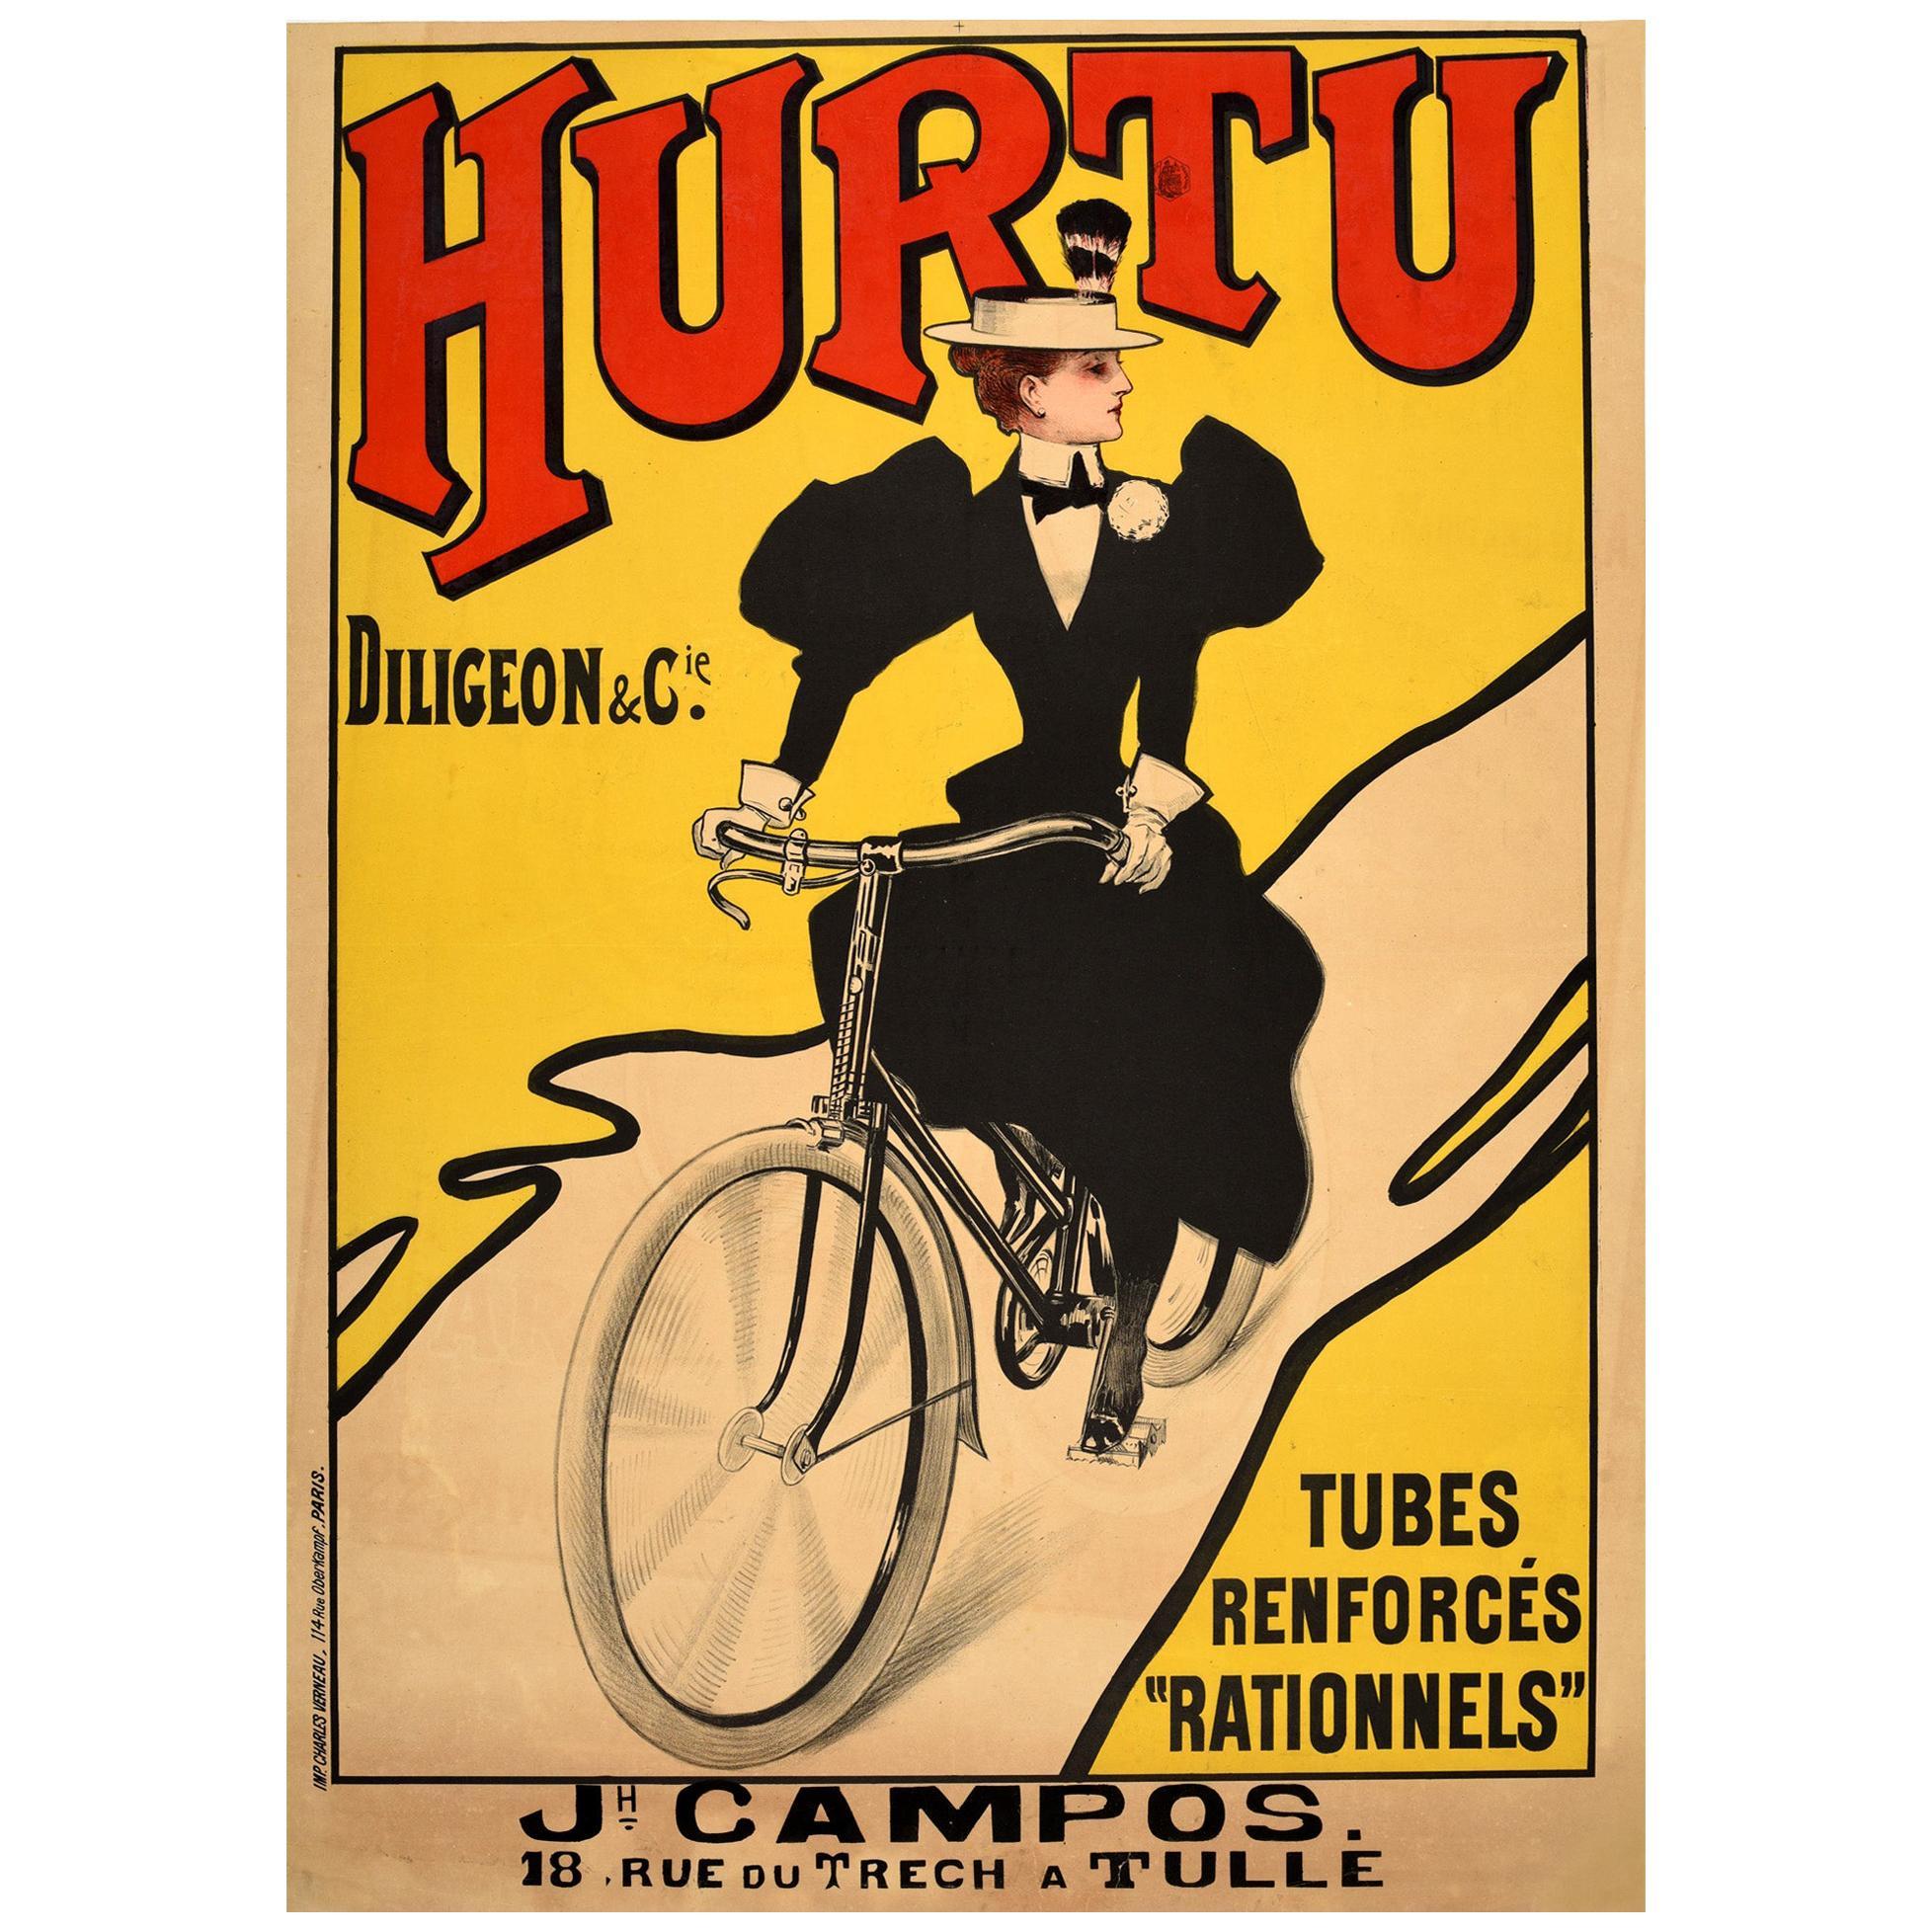 Original Antique Advertising Poster For Hurtu Bicycles Diligeon Et Cie Tubes